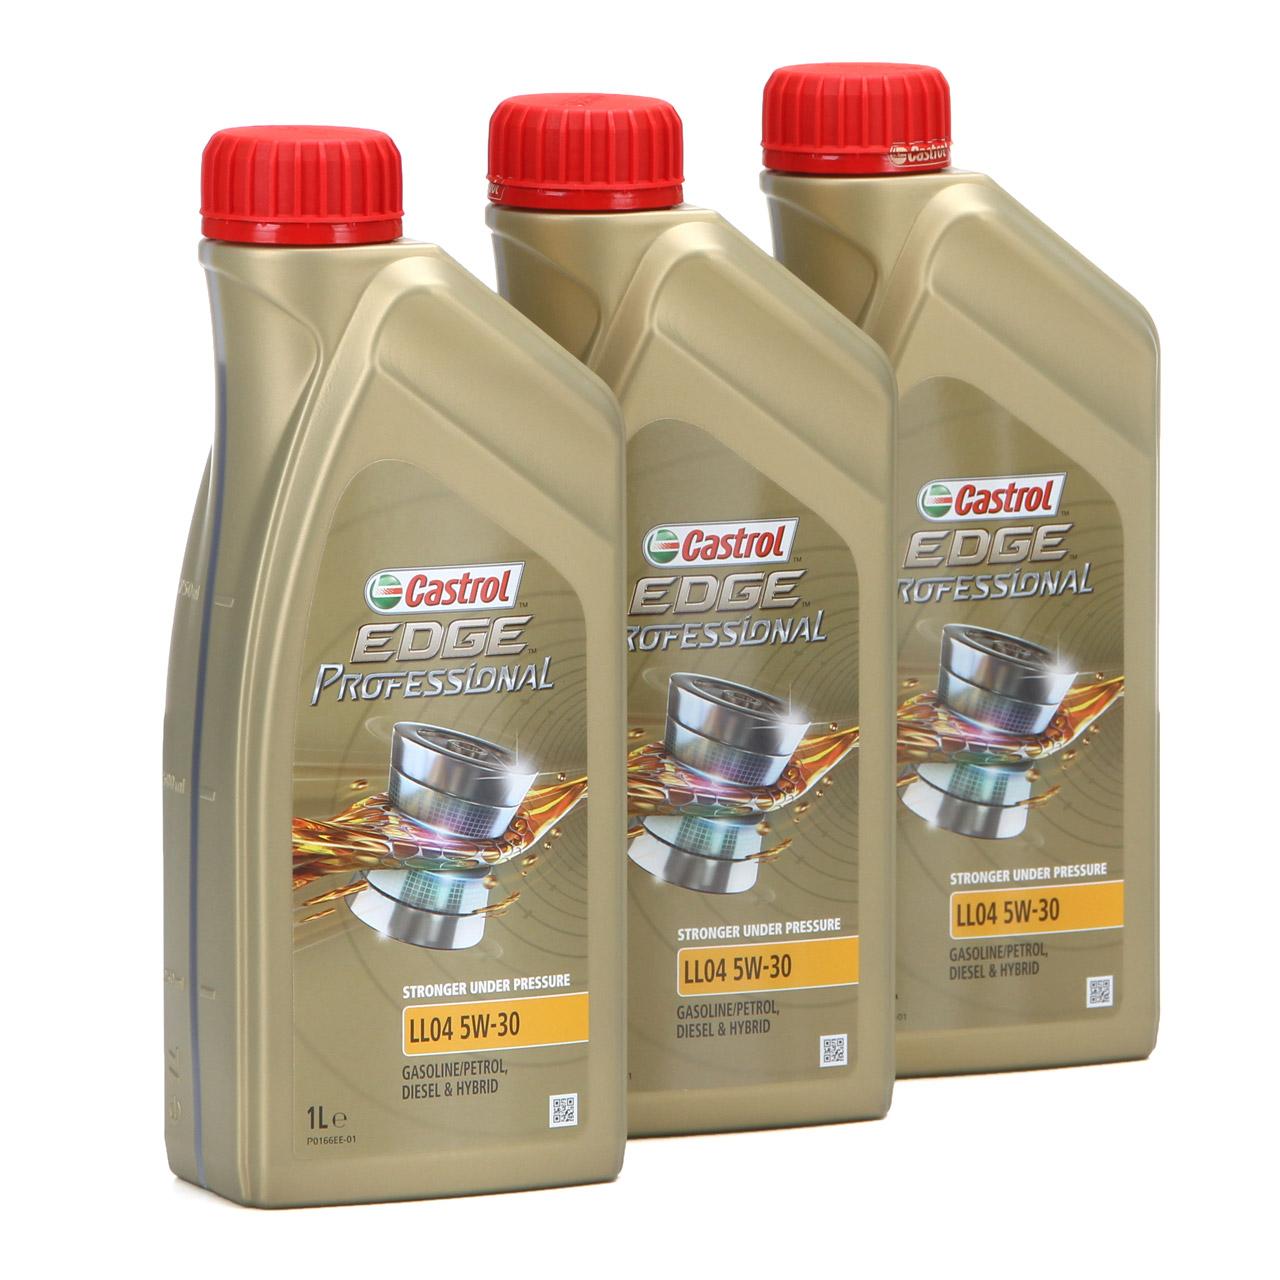 CASTROL EDGE Professional Motoröl Öl für BMW Longlife IV LL04 5W-30 - 3 Liter